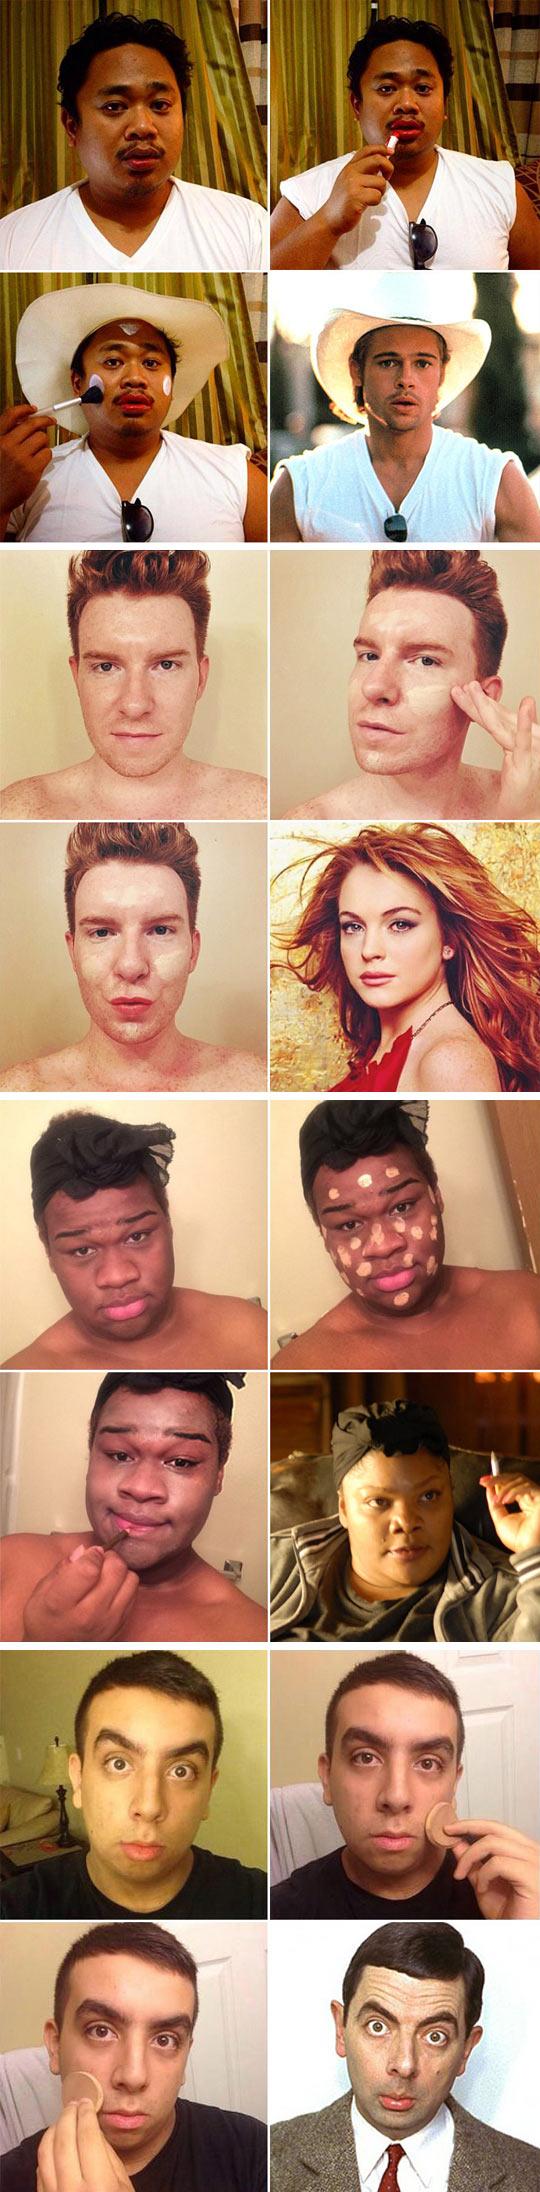 funny-men-makeup-famous-actors